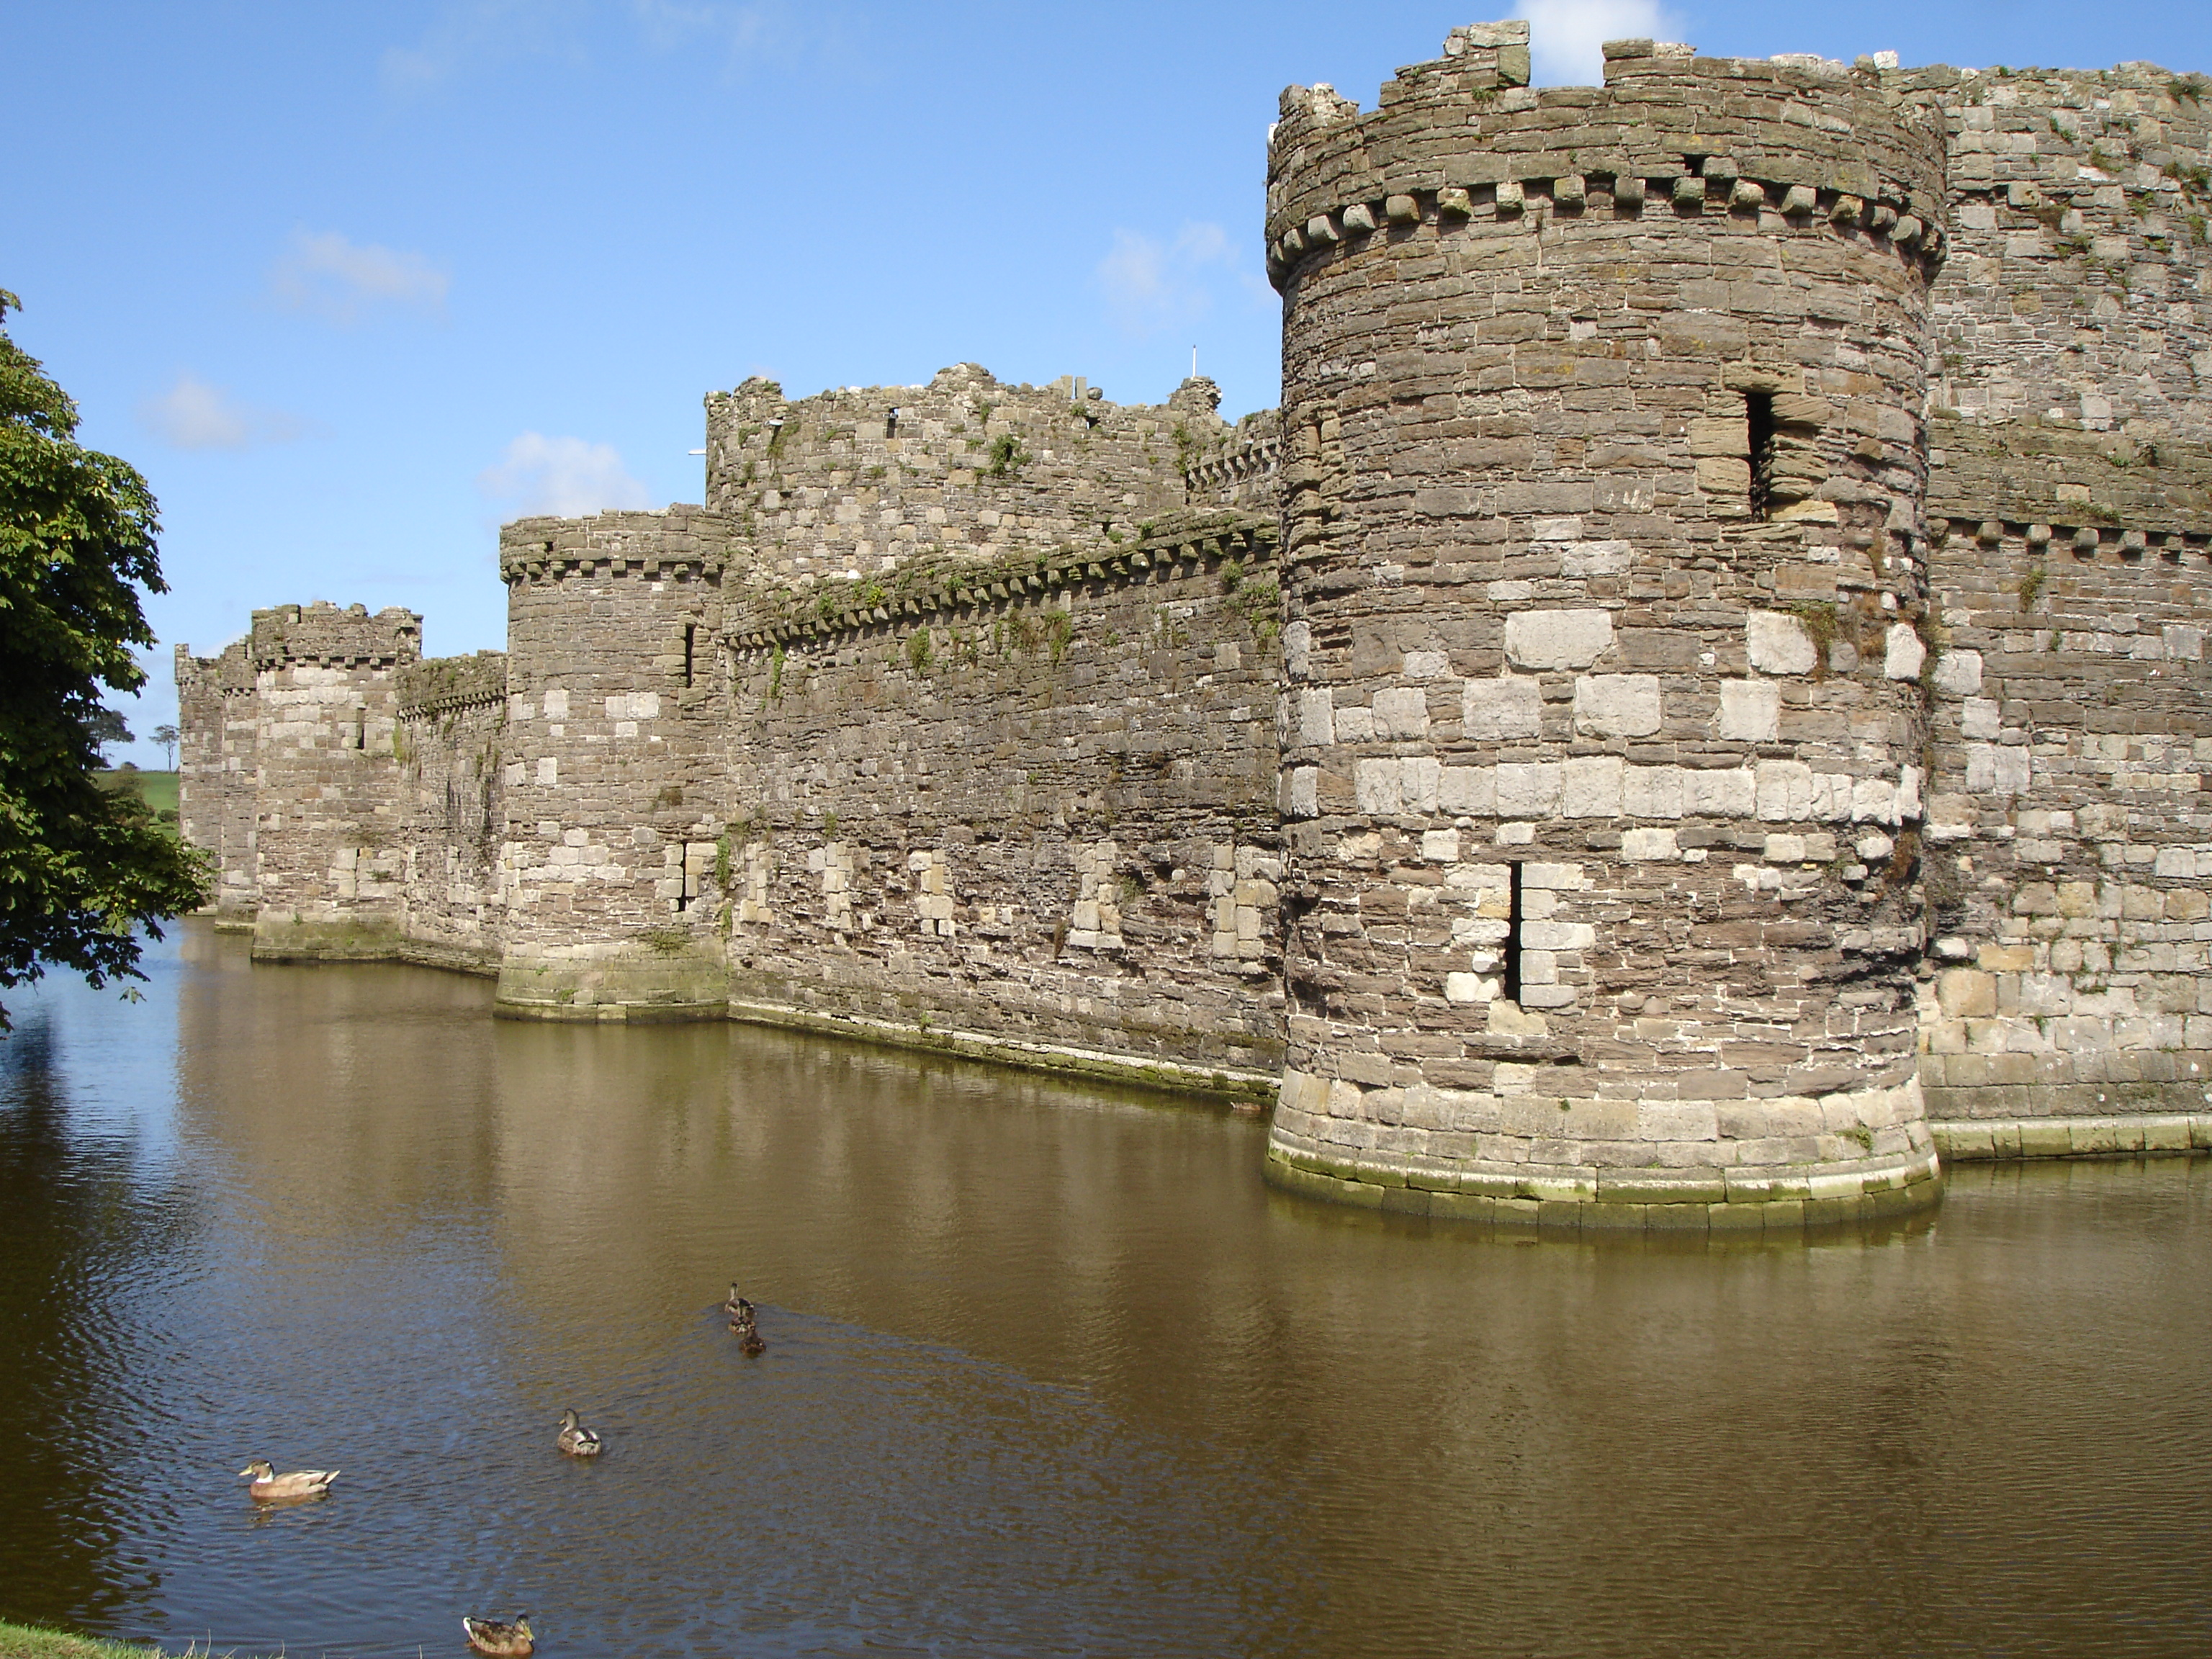 File Beaumaris Circular Towers And Moat Wikipedia